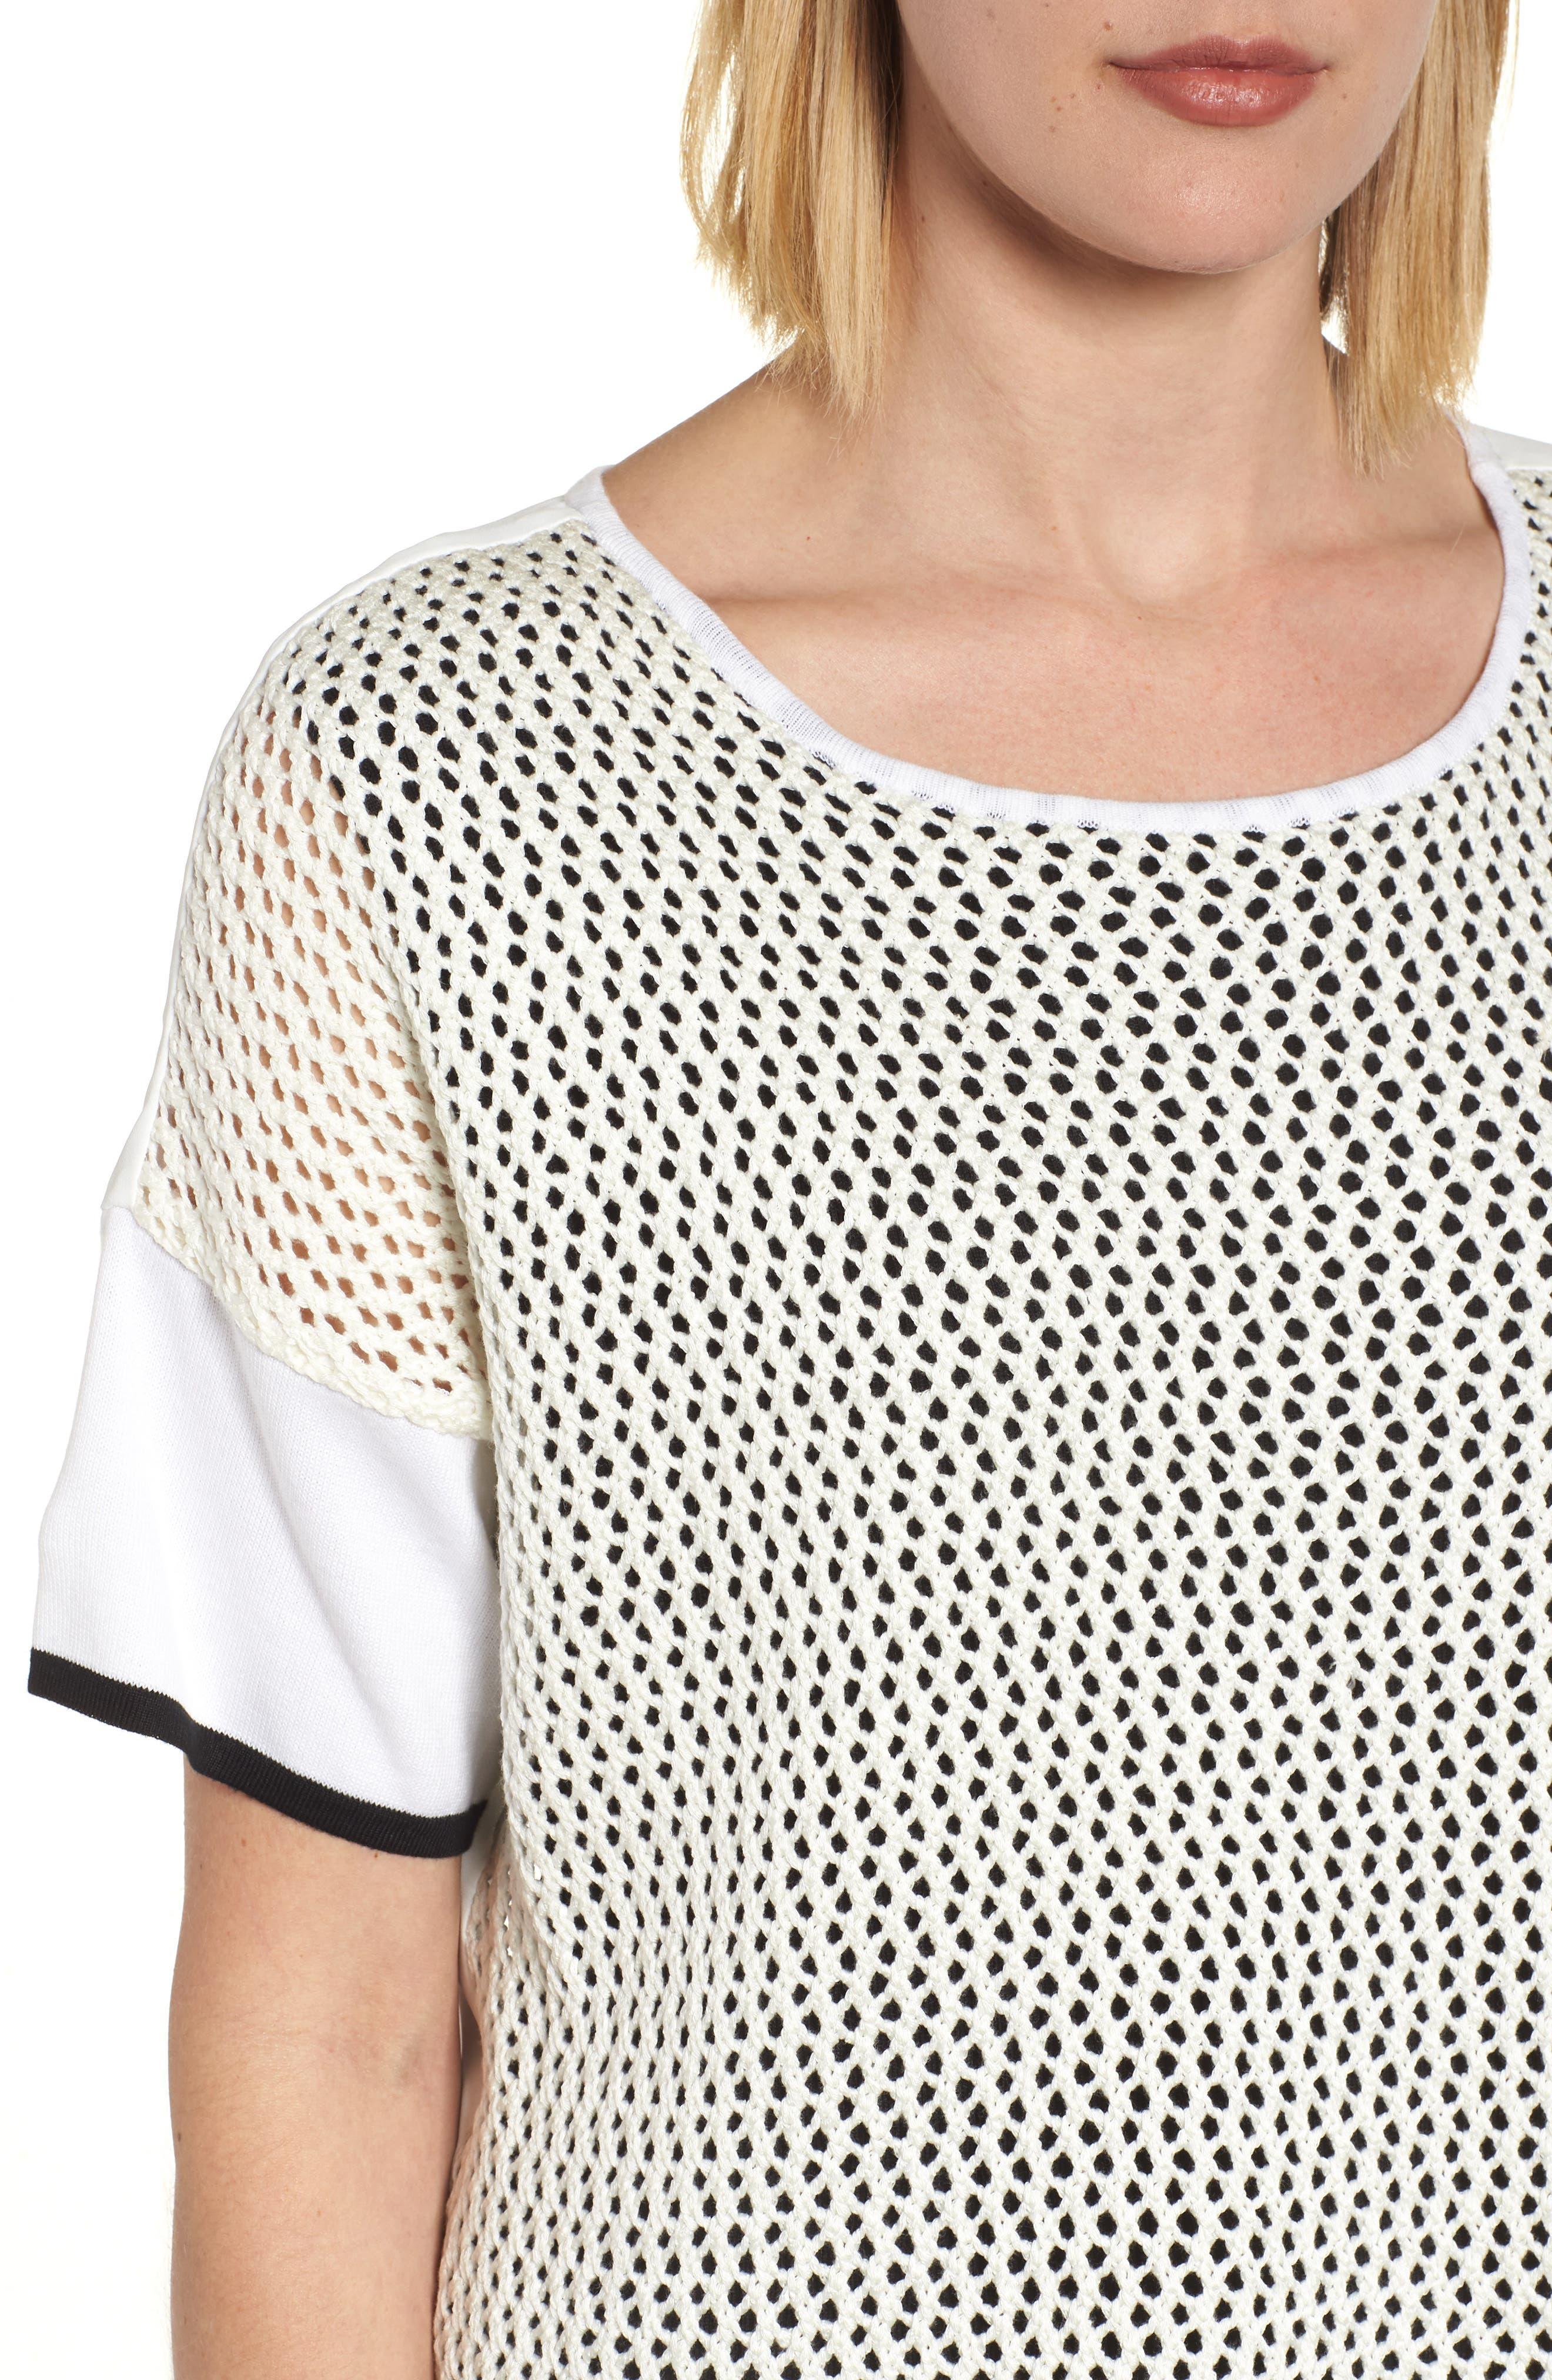 Mixed Media Short Sleeve Tunic Top,                             Alternate thumbnail 4, color,                             White/ Black